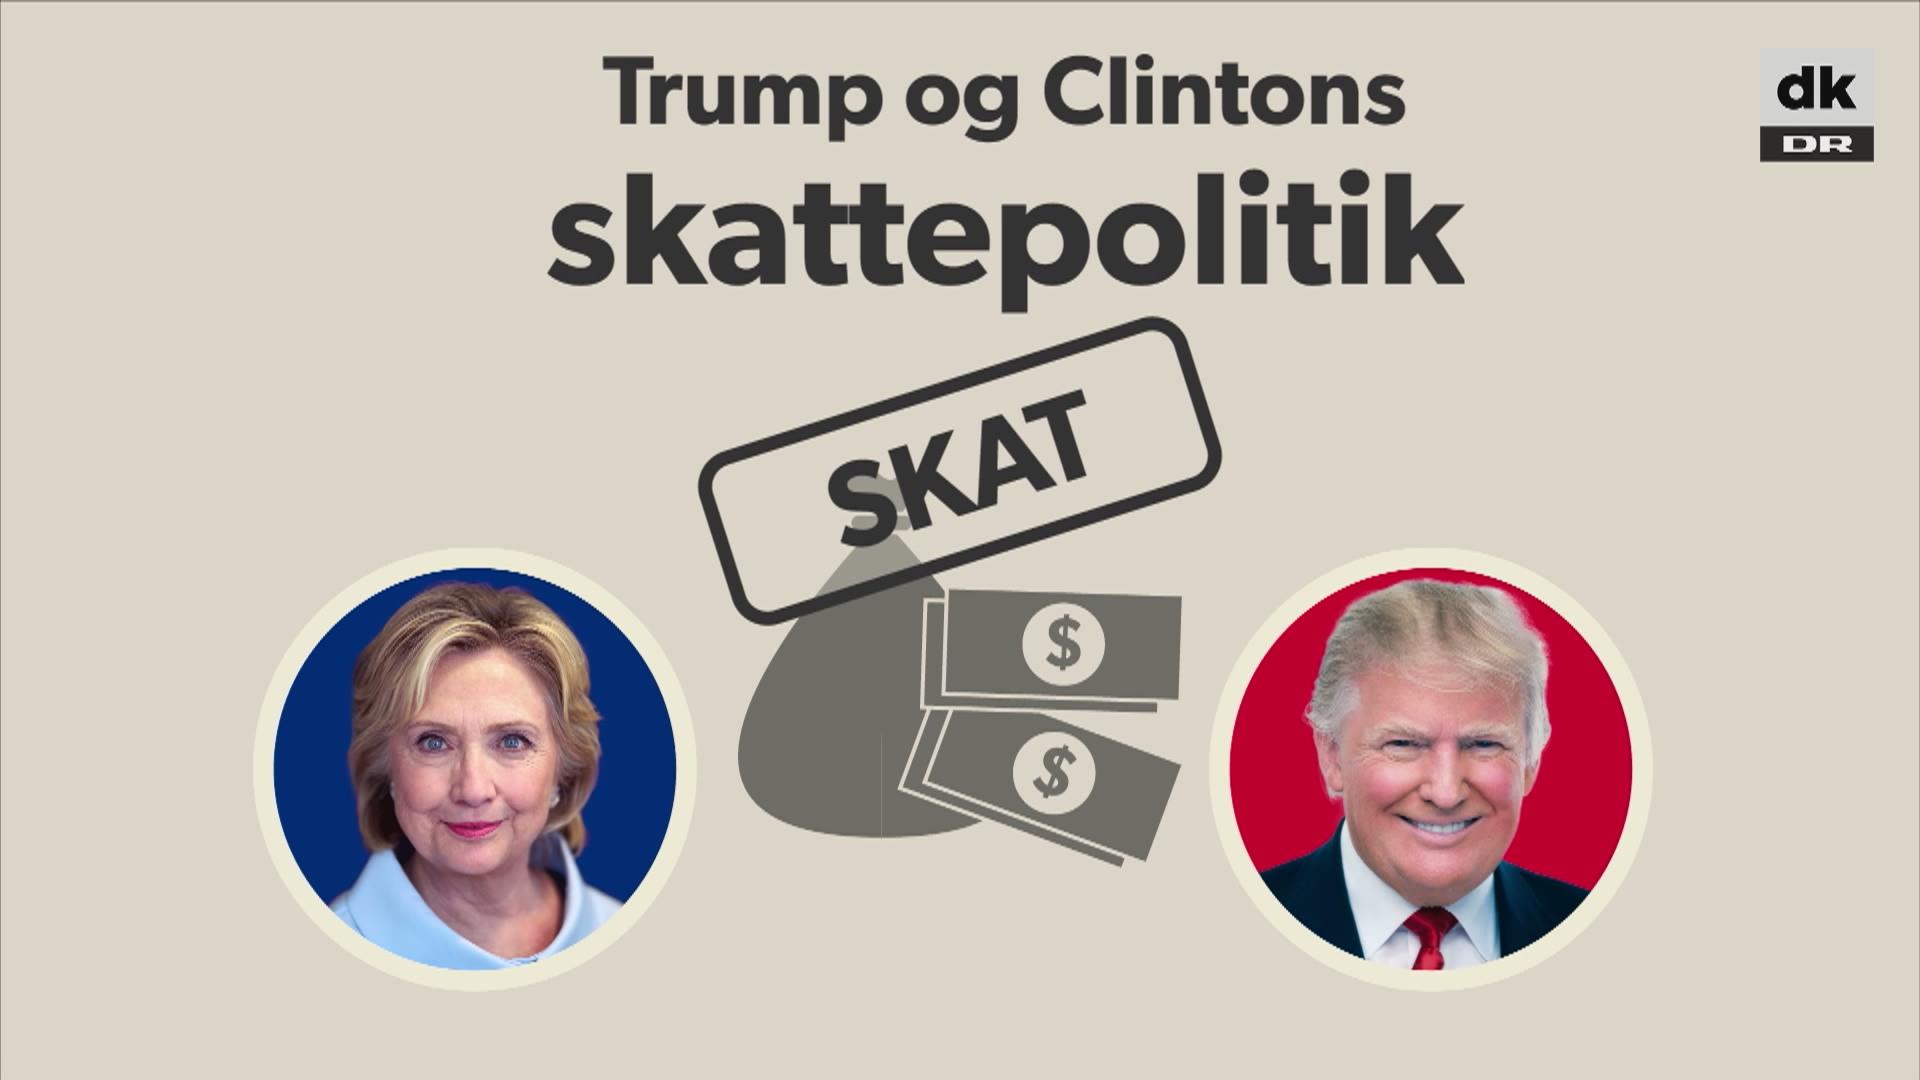 drdk_trump_clinton_oekonomi_explainer_00000110_0.jpeg